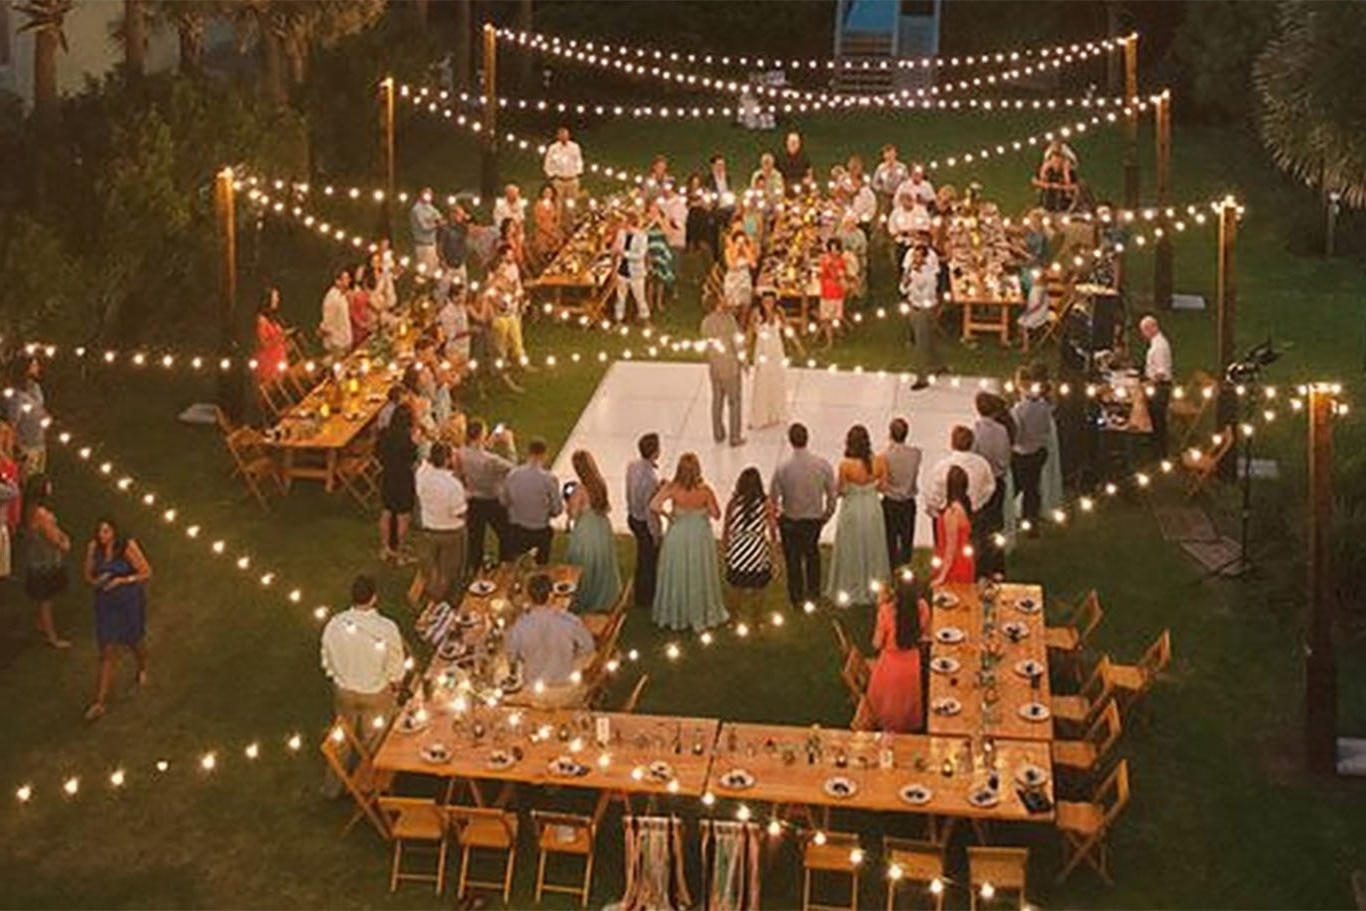 Famous Small Bedroom Size Beautiful Wedding Outdoor Lights Craluxlighting Regarding Outdoor Lanterns For Wedding (View 3 of 20)